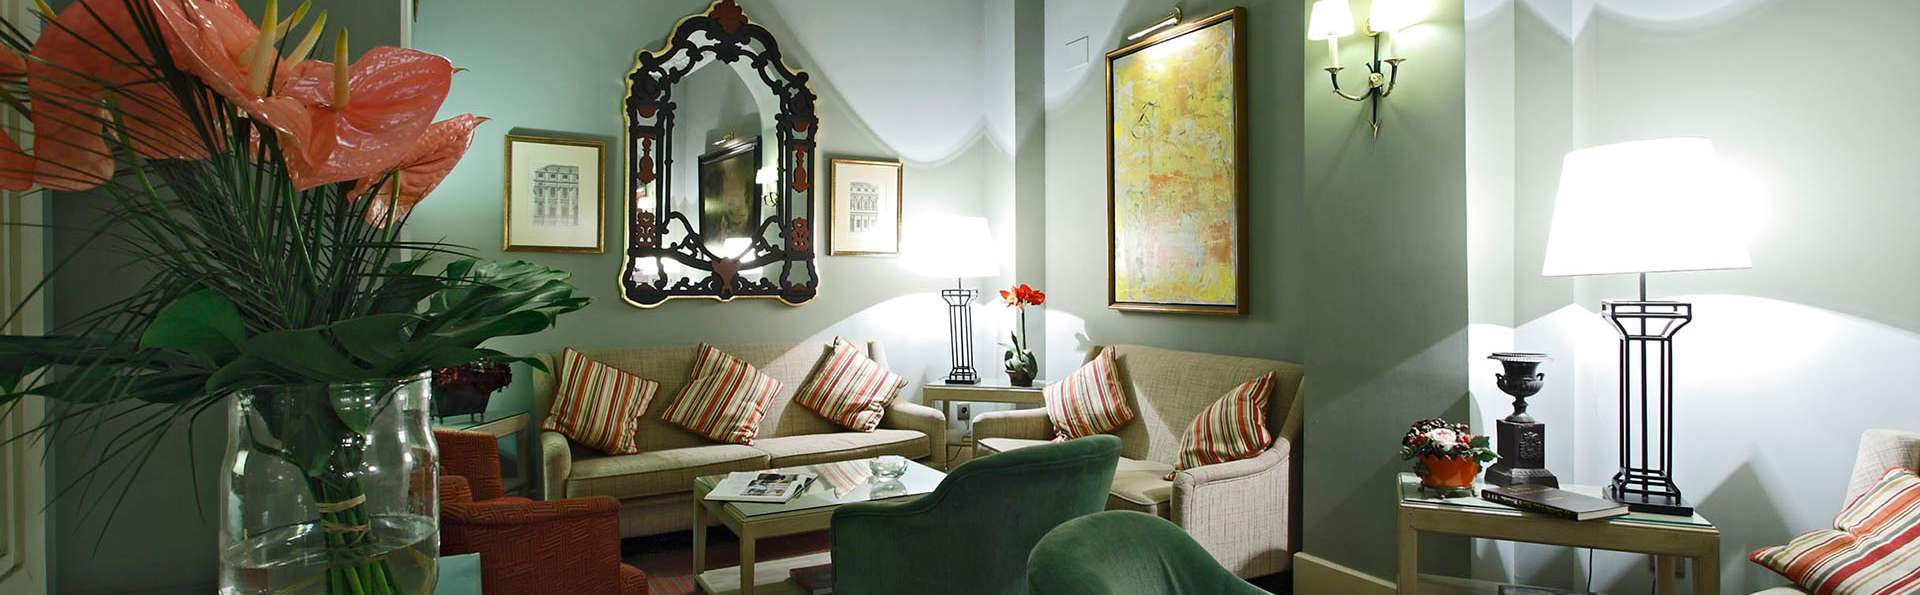 Casa Romana Hotel Boutique - EDIT_salon.jpg